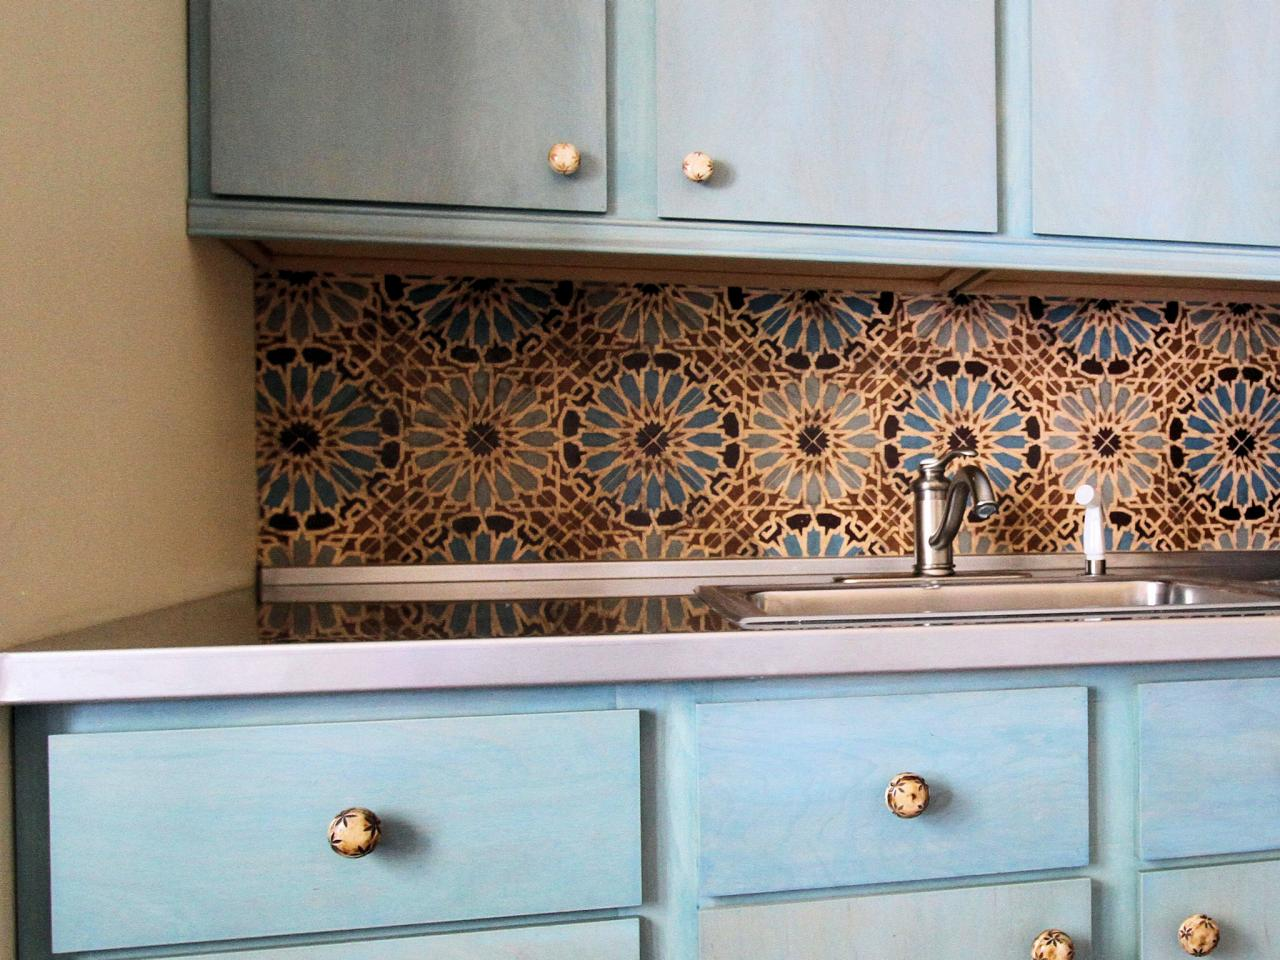 Contemporary Kitchen Tile Backsplash Ideas kitchen tile backsplash designs